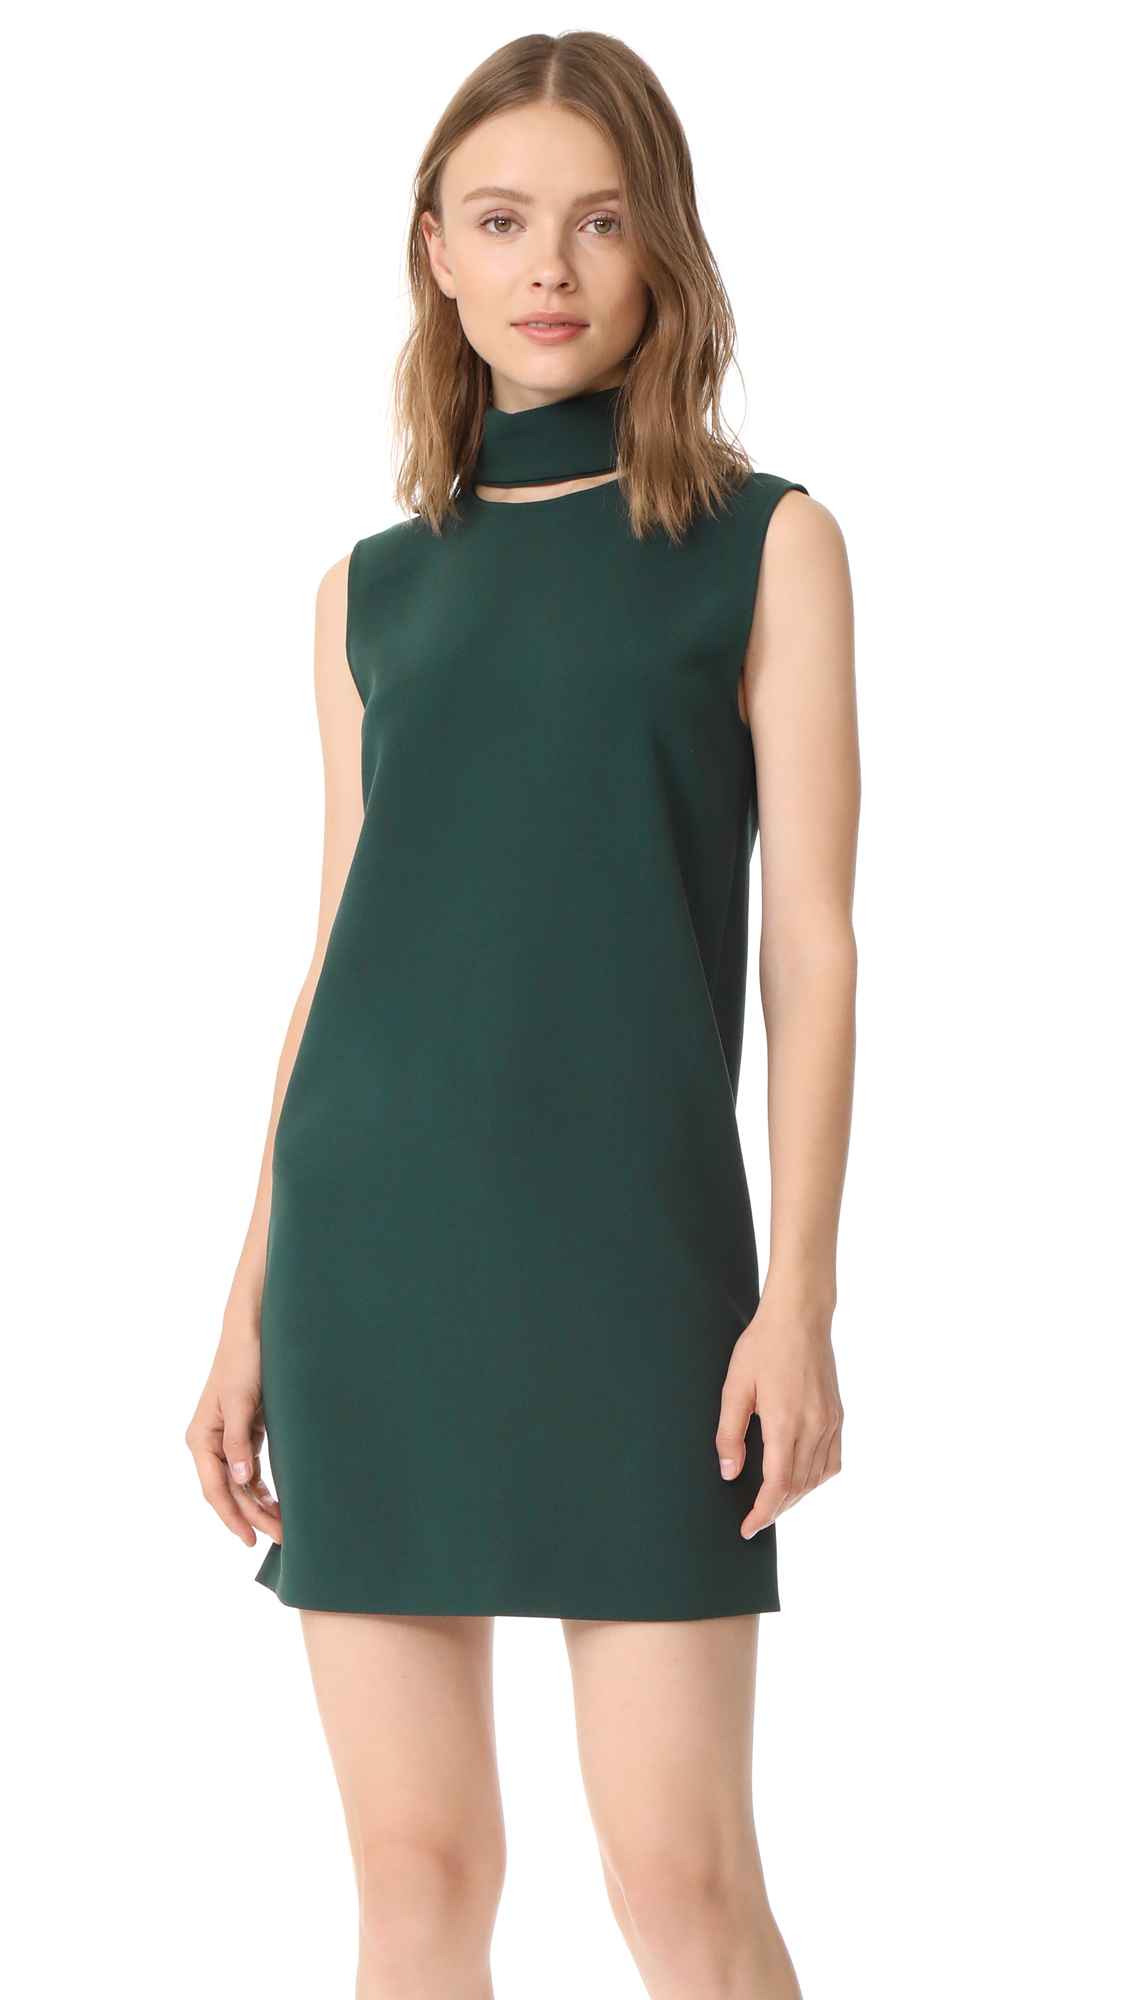 Theory Slit Collar Dress - Billiard